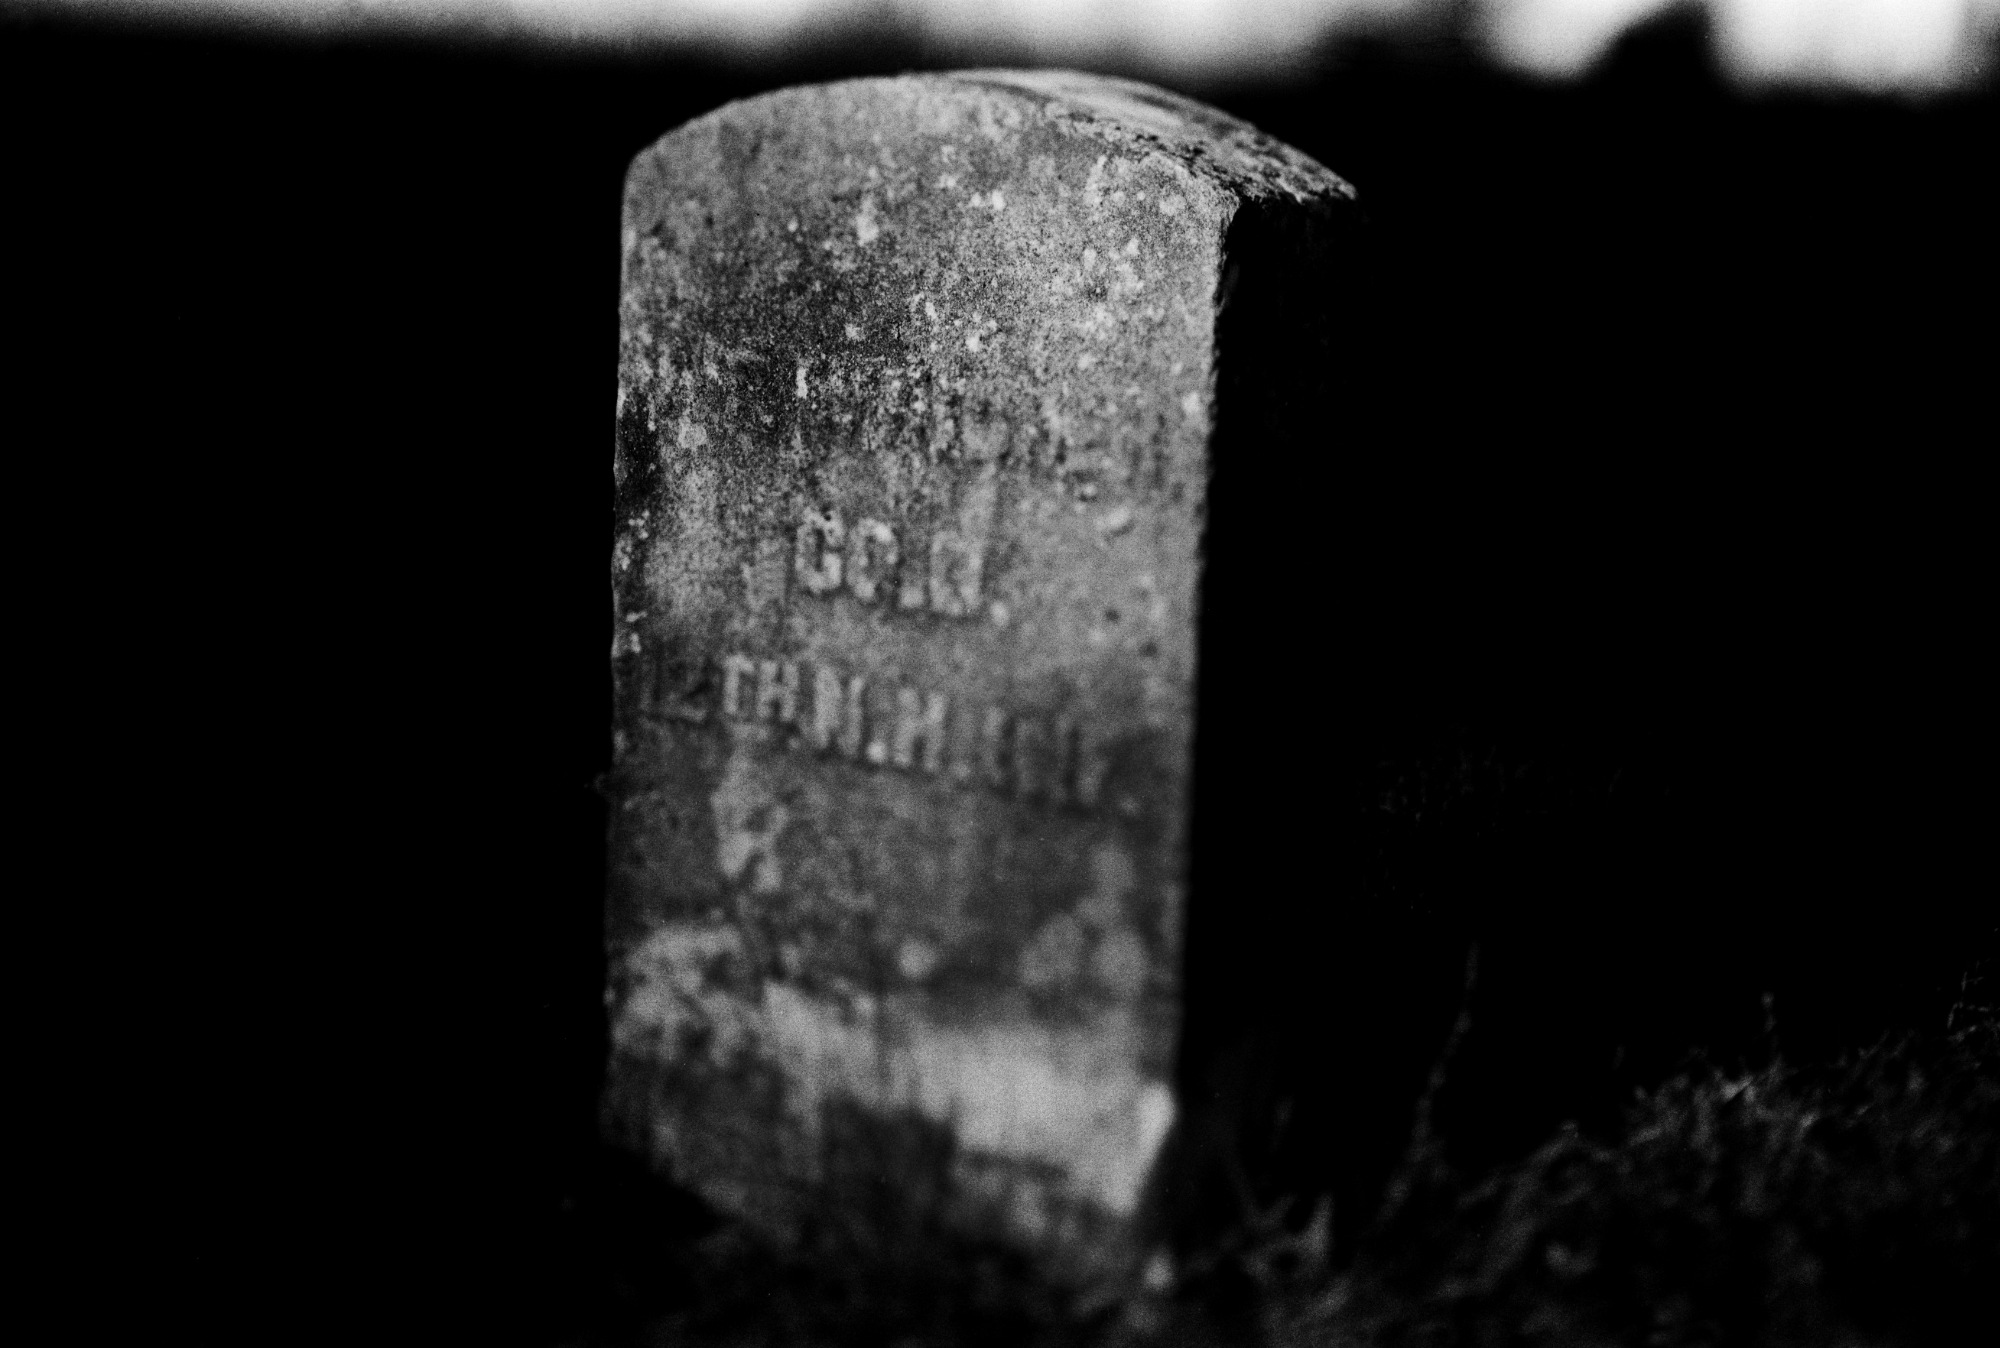 medium format film photograph. by d.l. roth